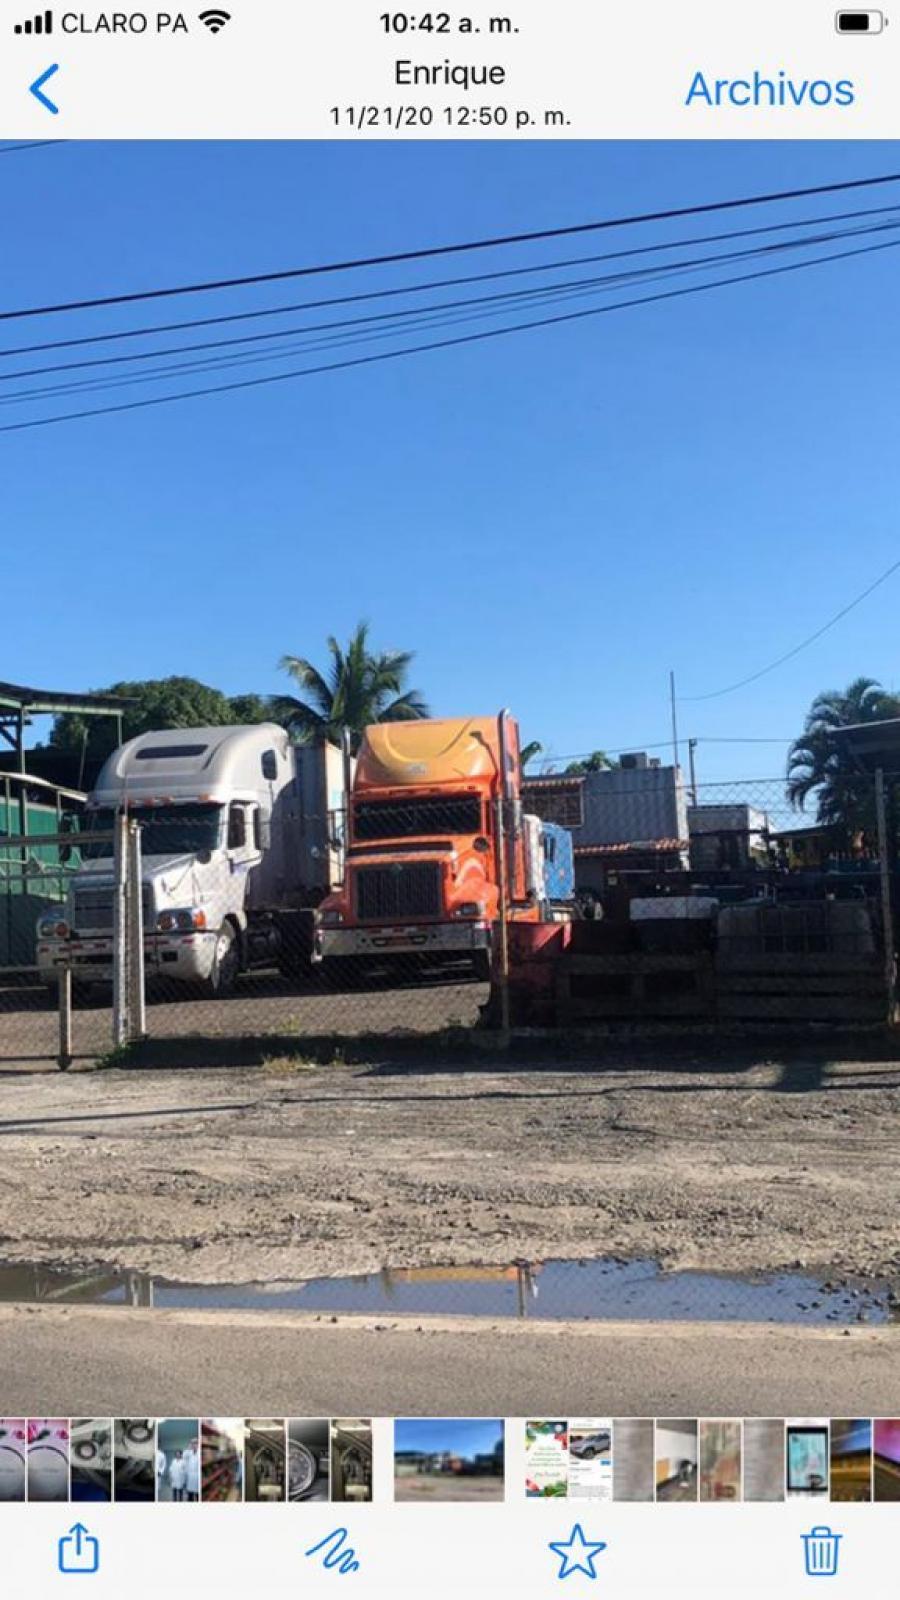 Foto Terreno en Venta en Juan Diaz, Juan D�az, Panam� - U$D 150.000 - TEV42880 - BienesOnLine